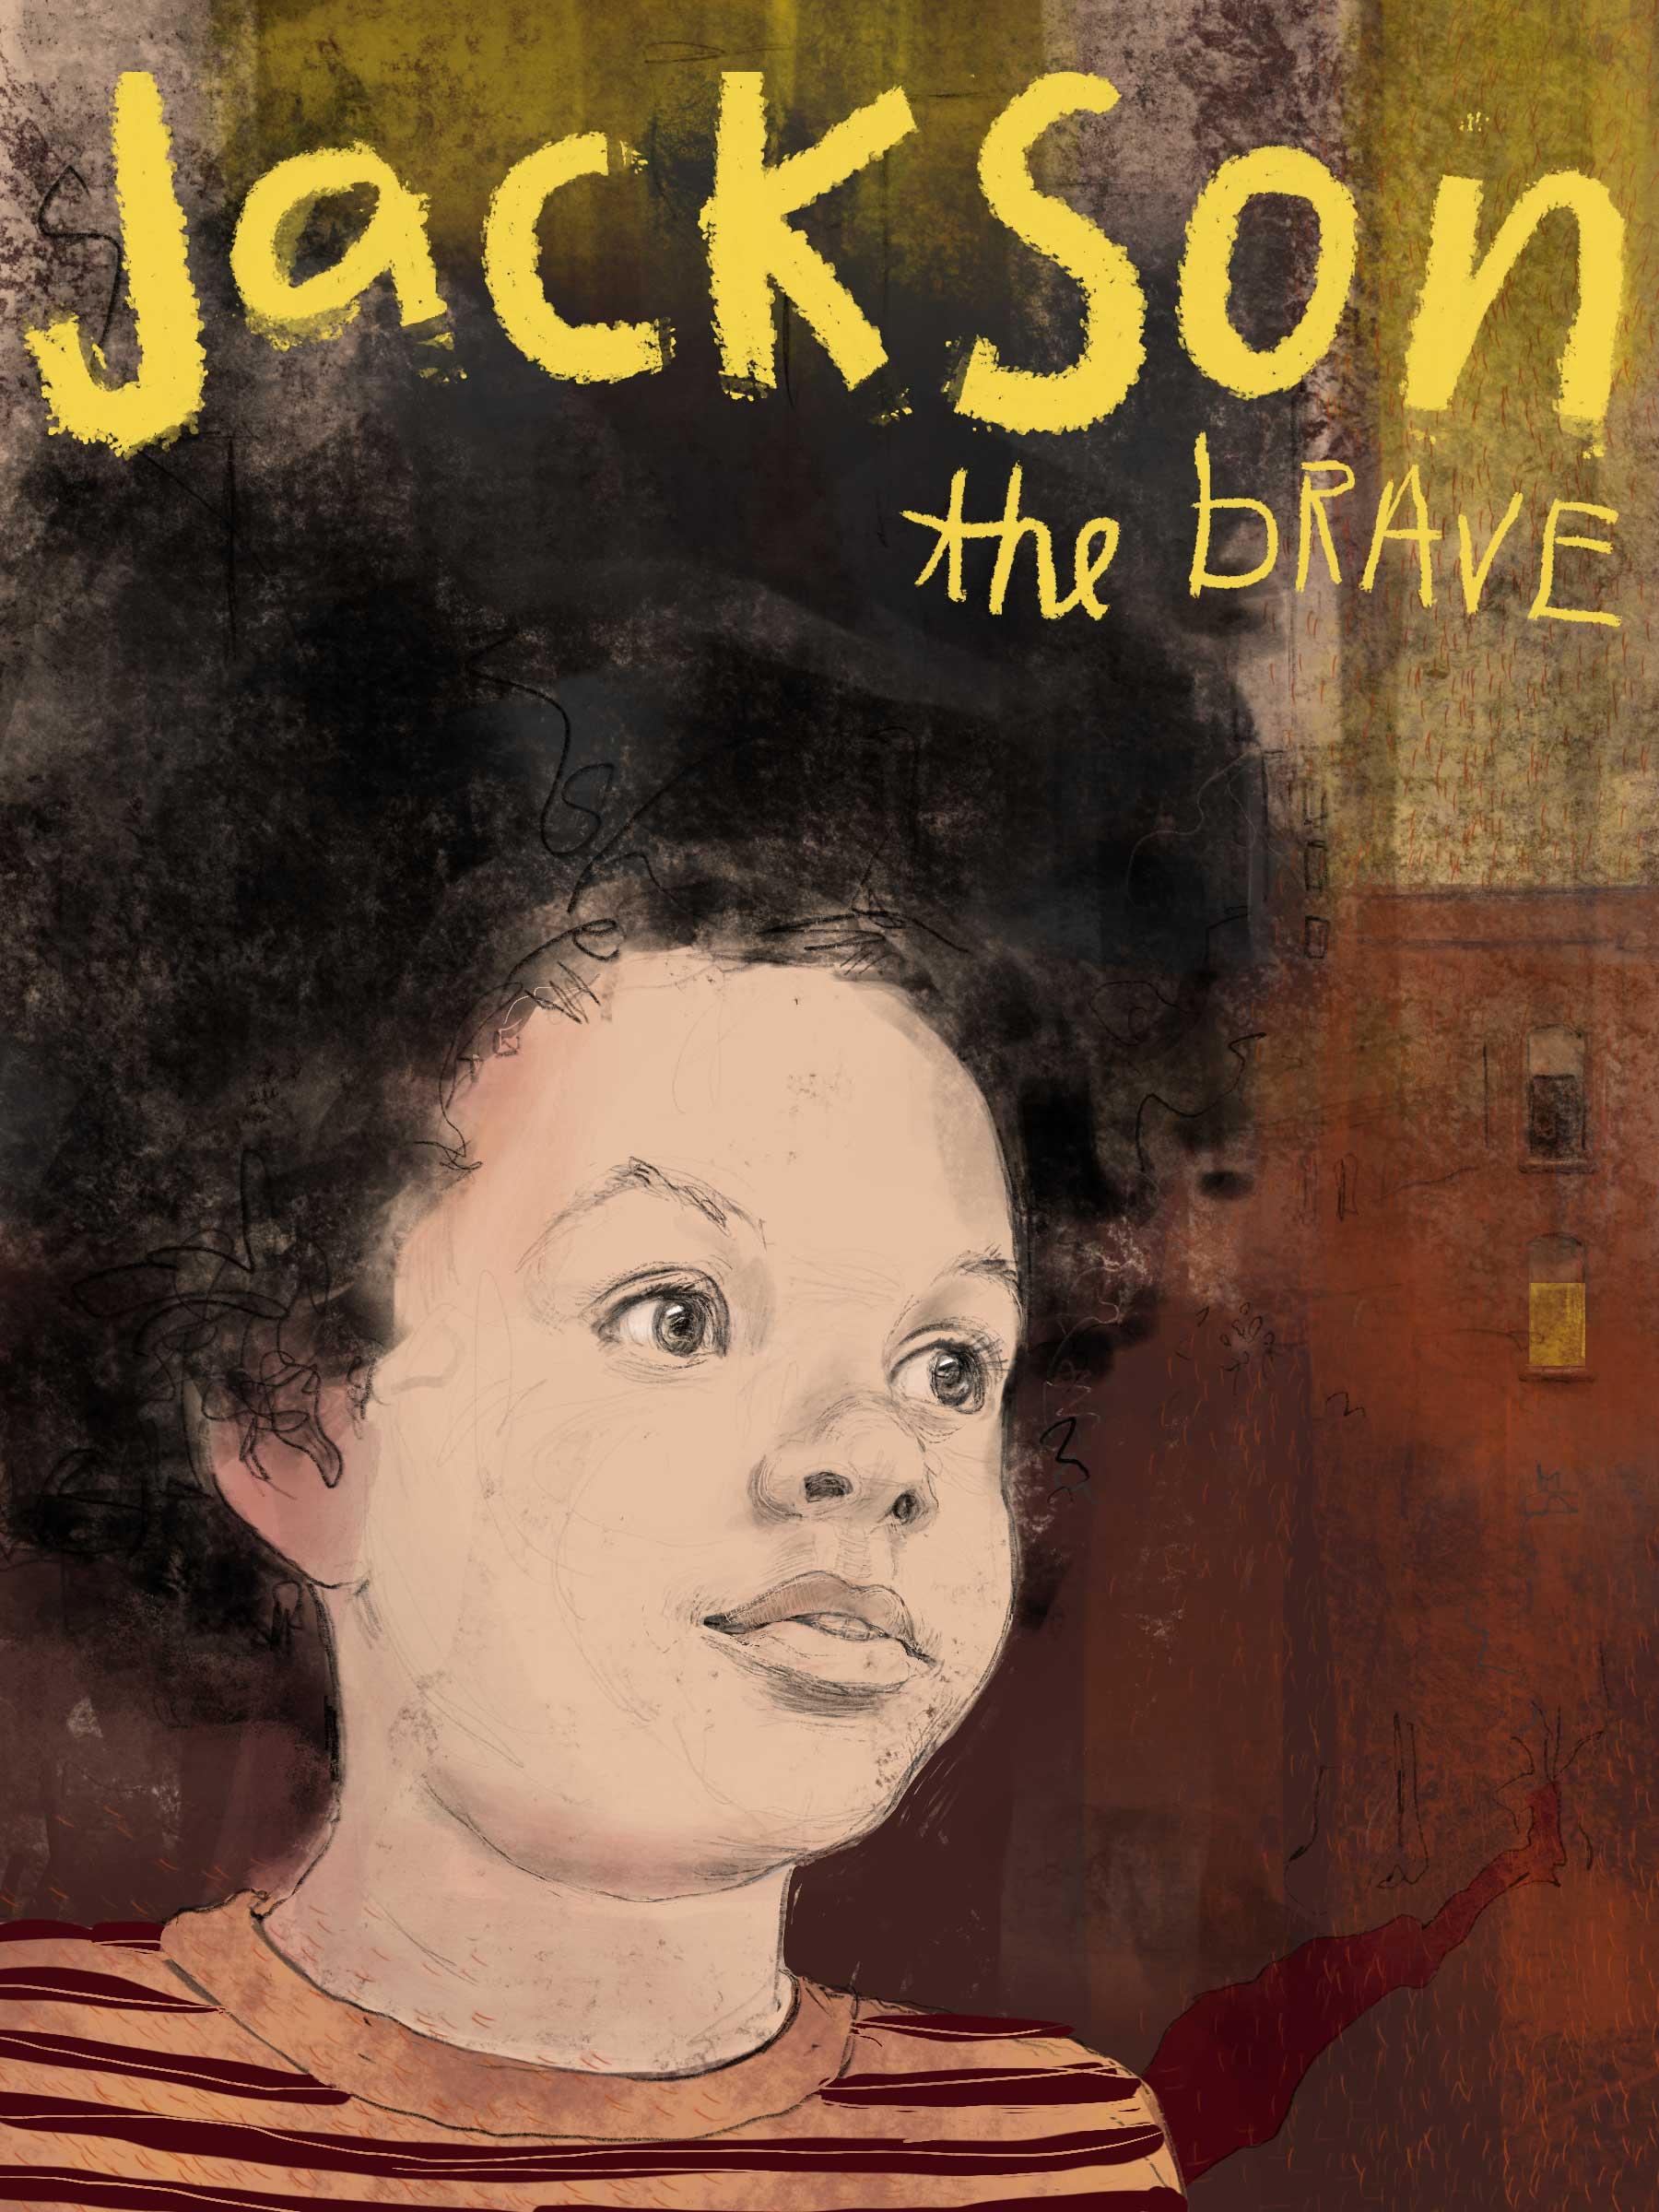 jackson-the-brave.jpg